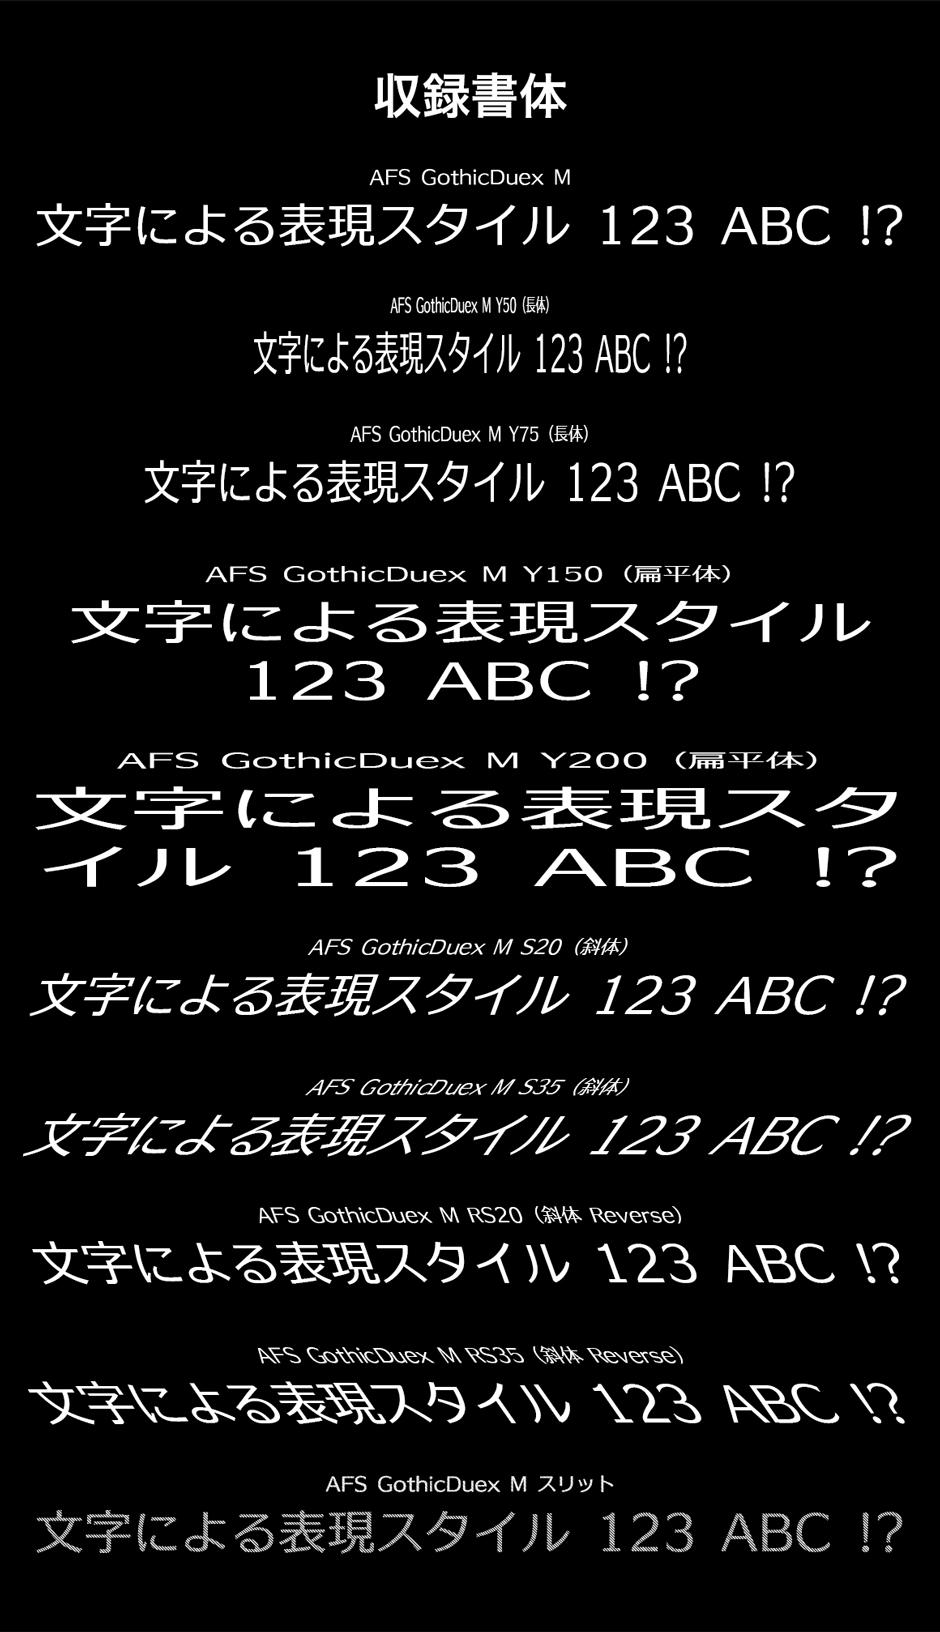 AFS ゴシックドゥ M